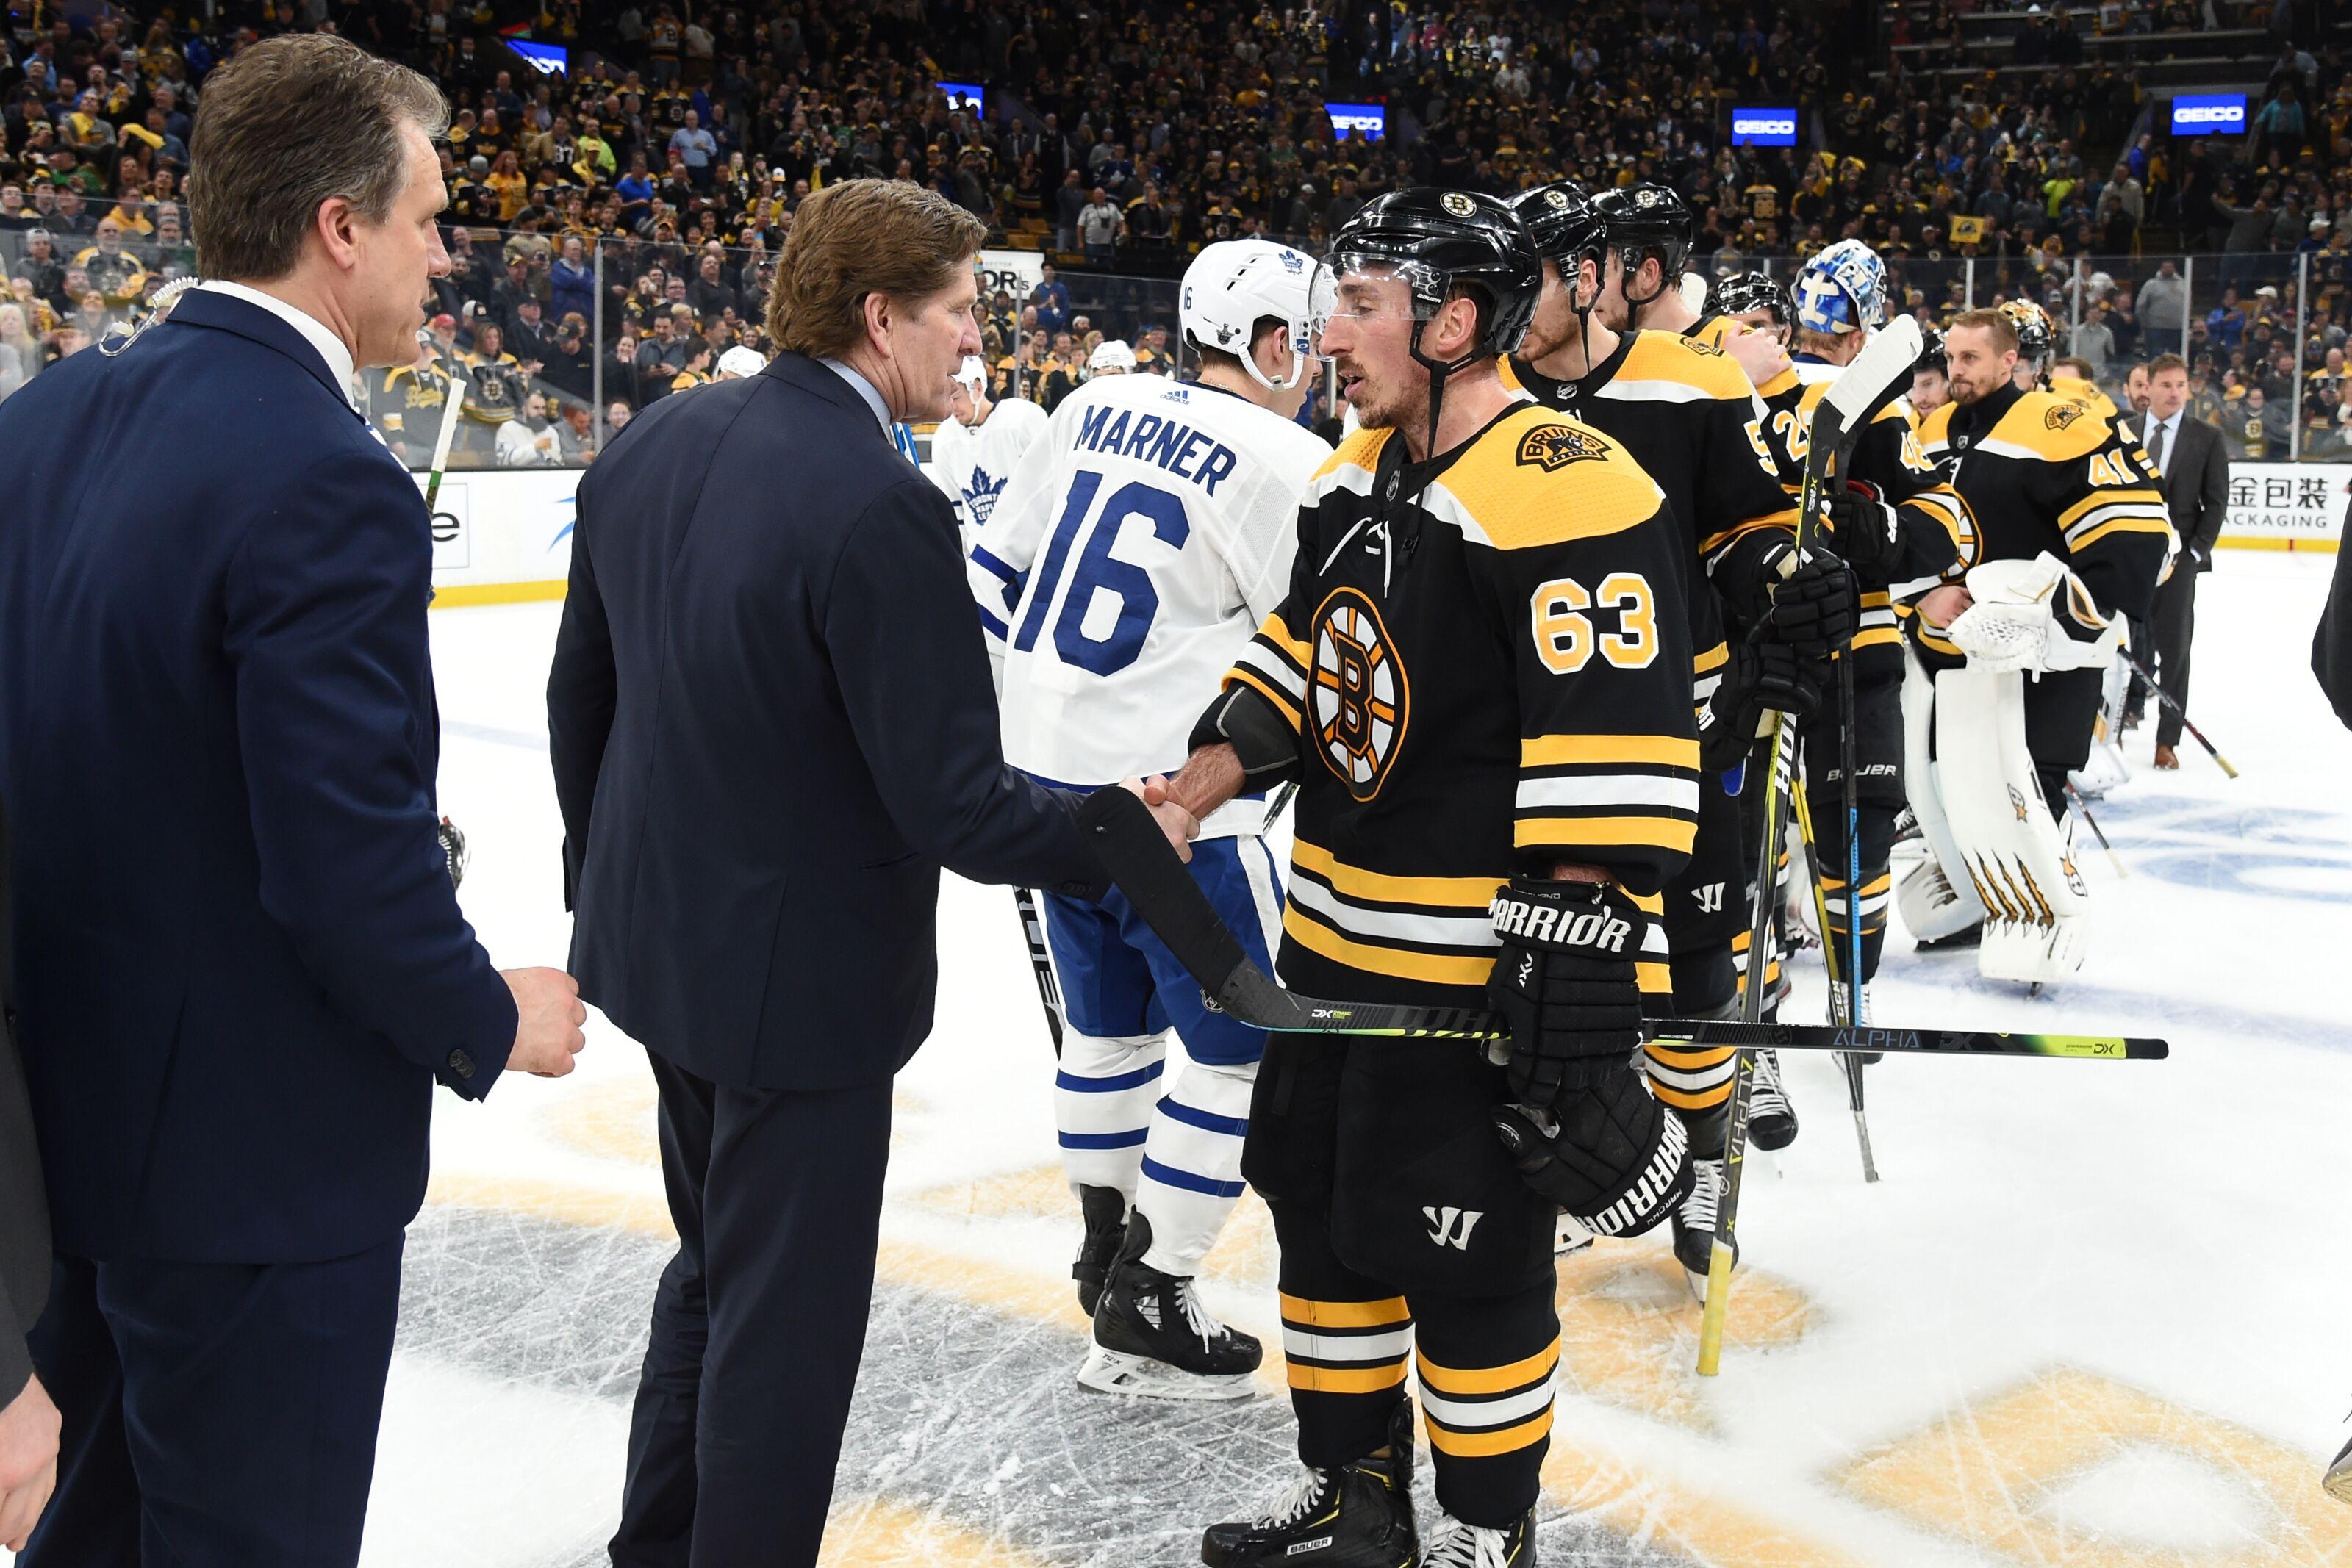 Boston Bruins: Mike Babcock names Bruins players he covets